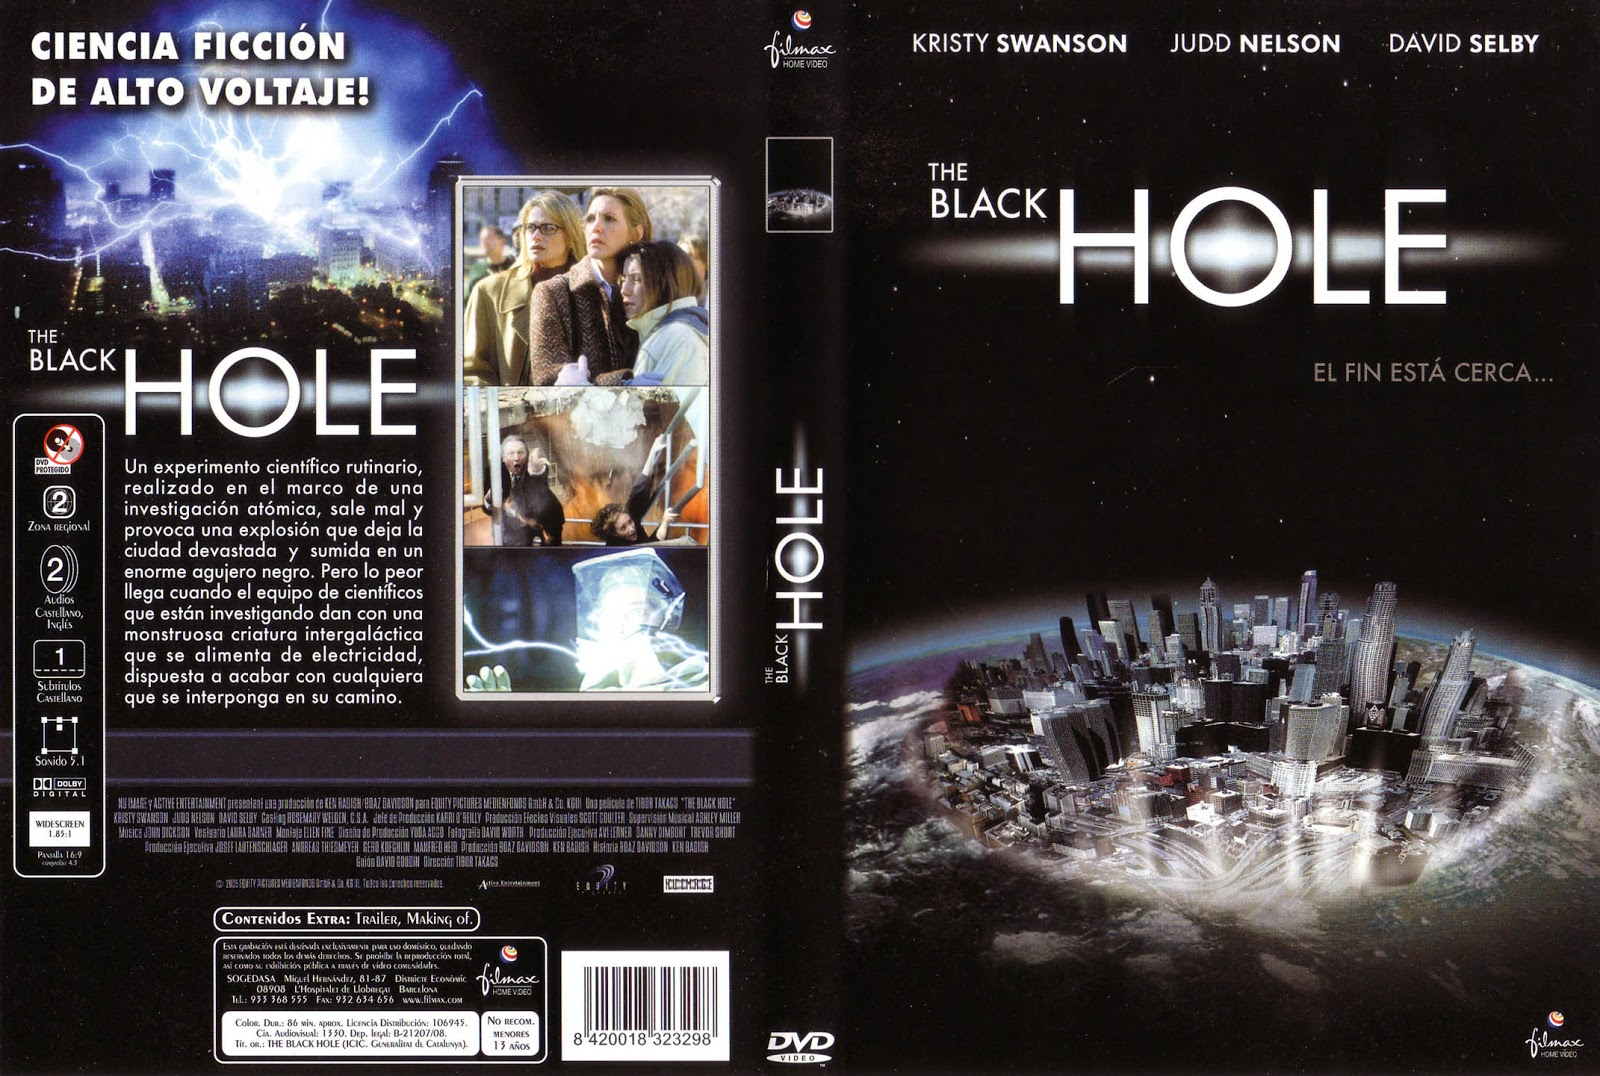 Adult Cd Universe black hole house images: black hole dvd